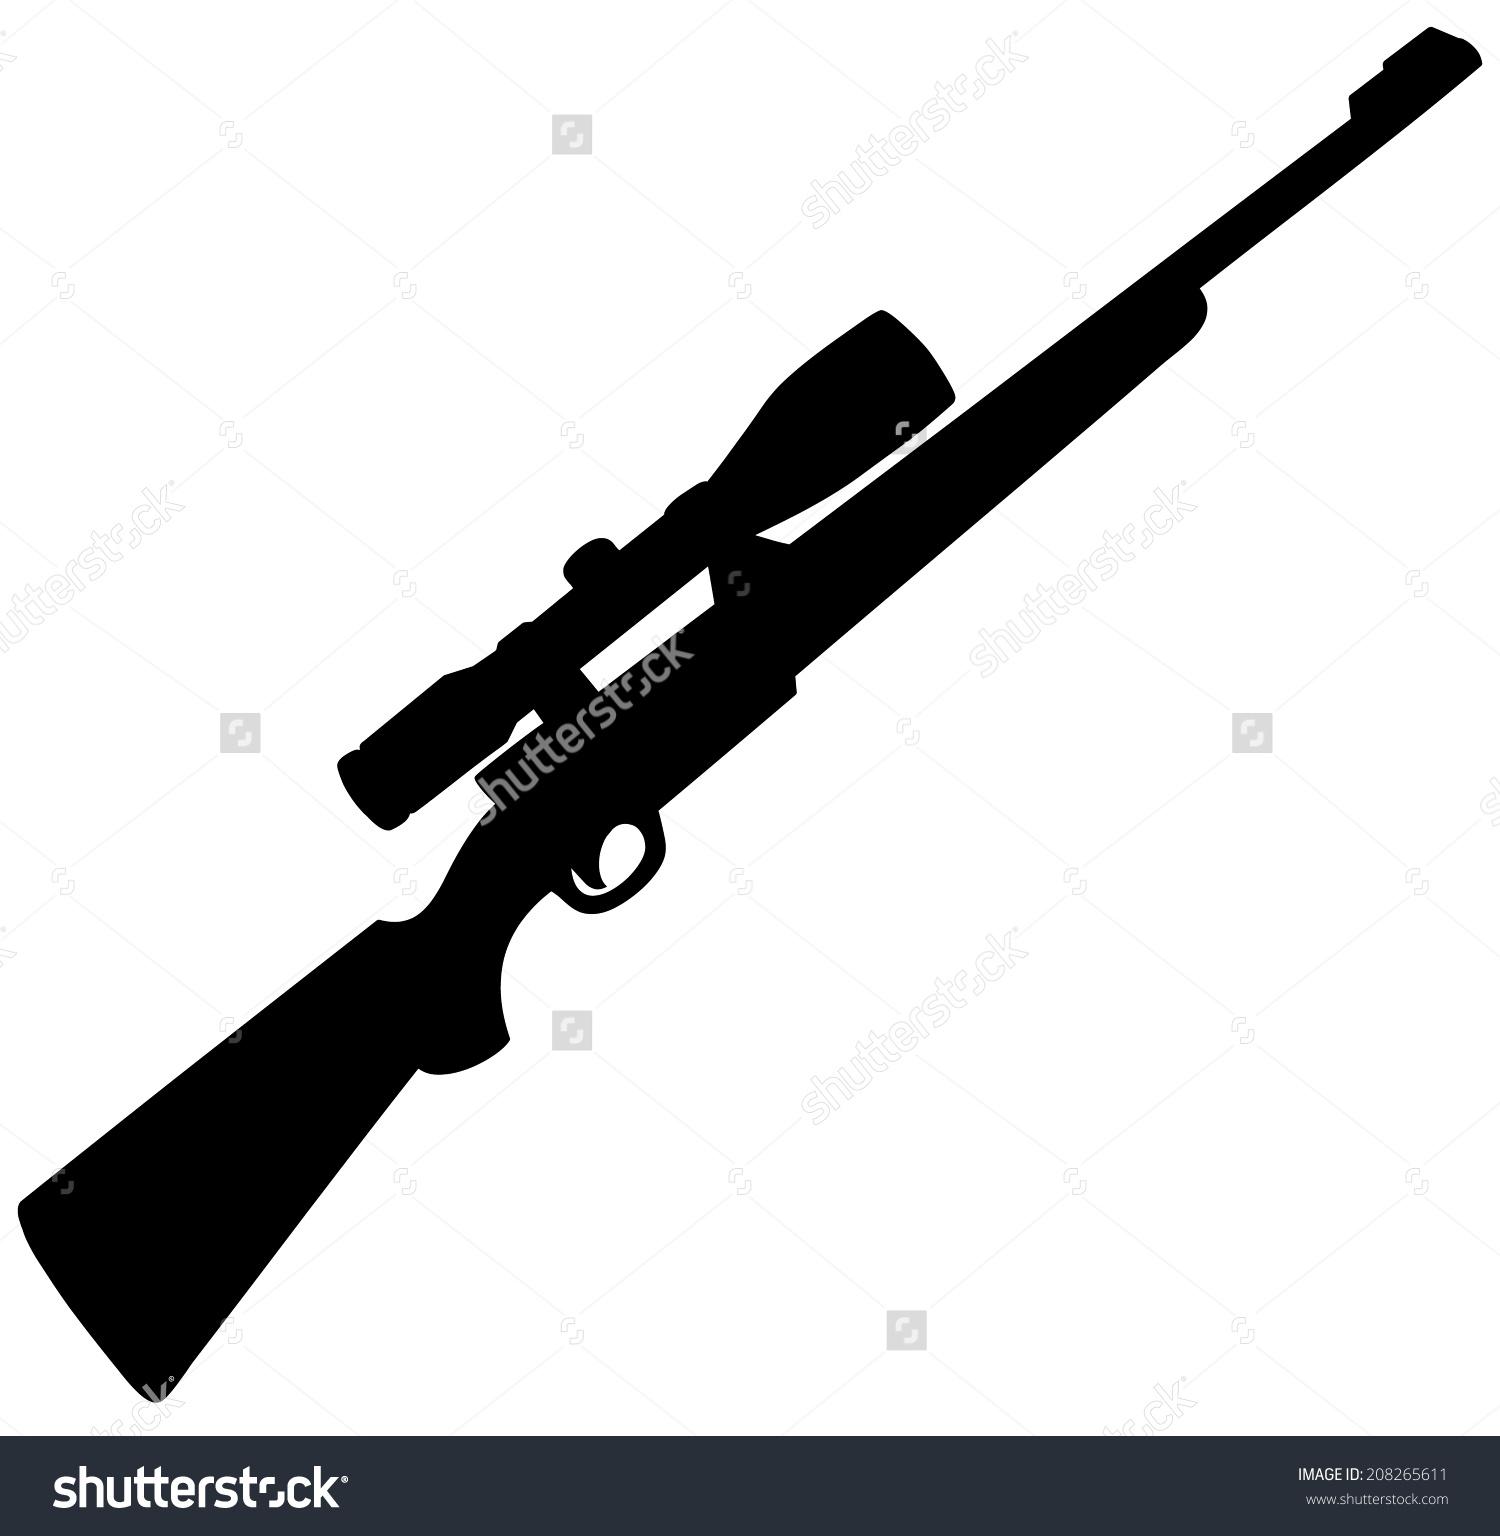 1500x1536 Gun Shot Clipart Crossed Rifle Many Interesting Cliparts